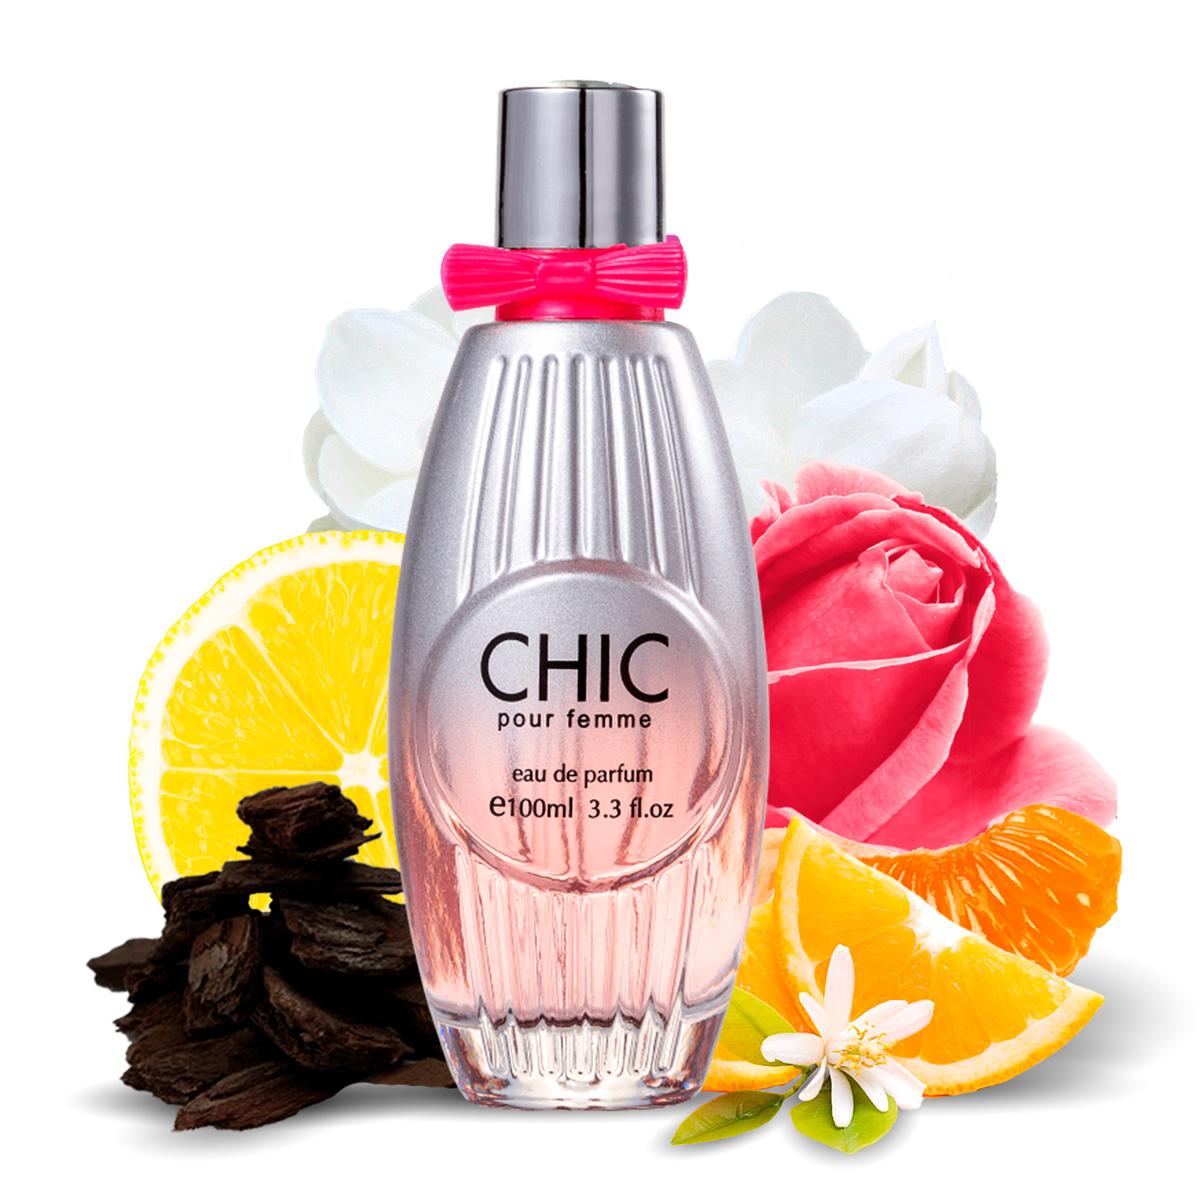 Kit 2 Perfumes Importados Chic e Super Rich I Scents